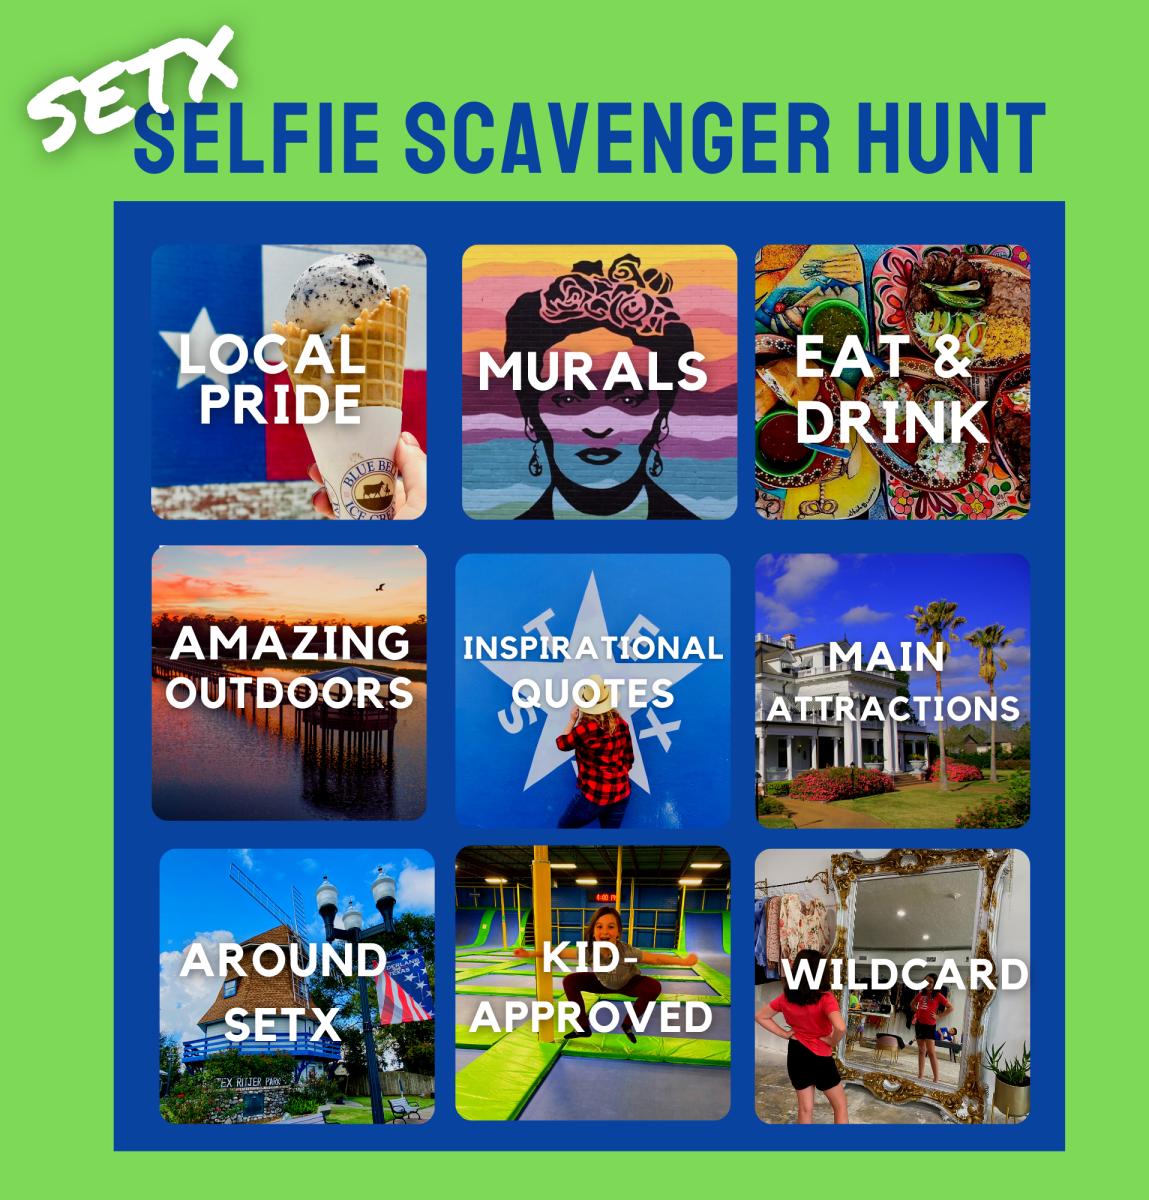 setx selfie scavenger hunt